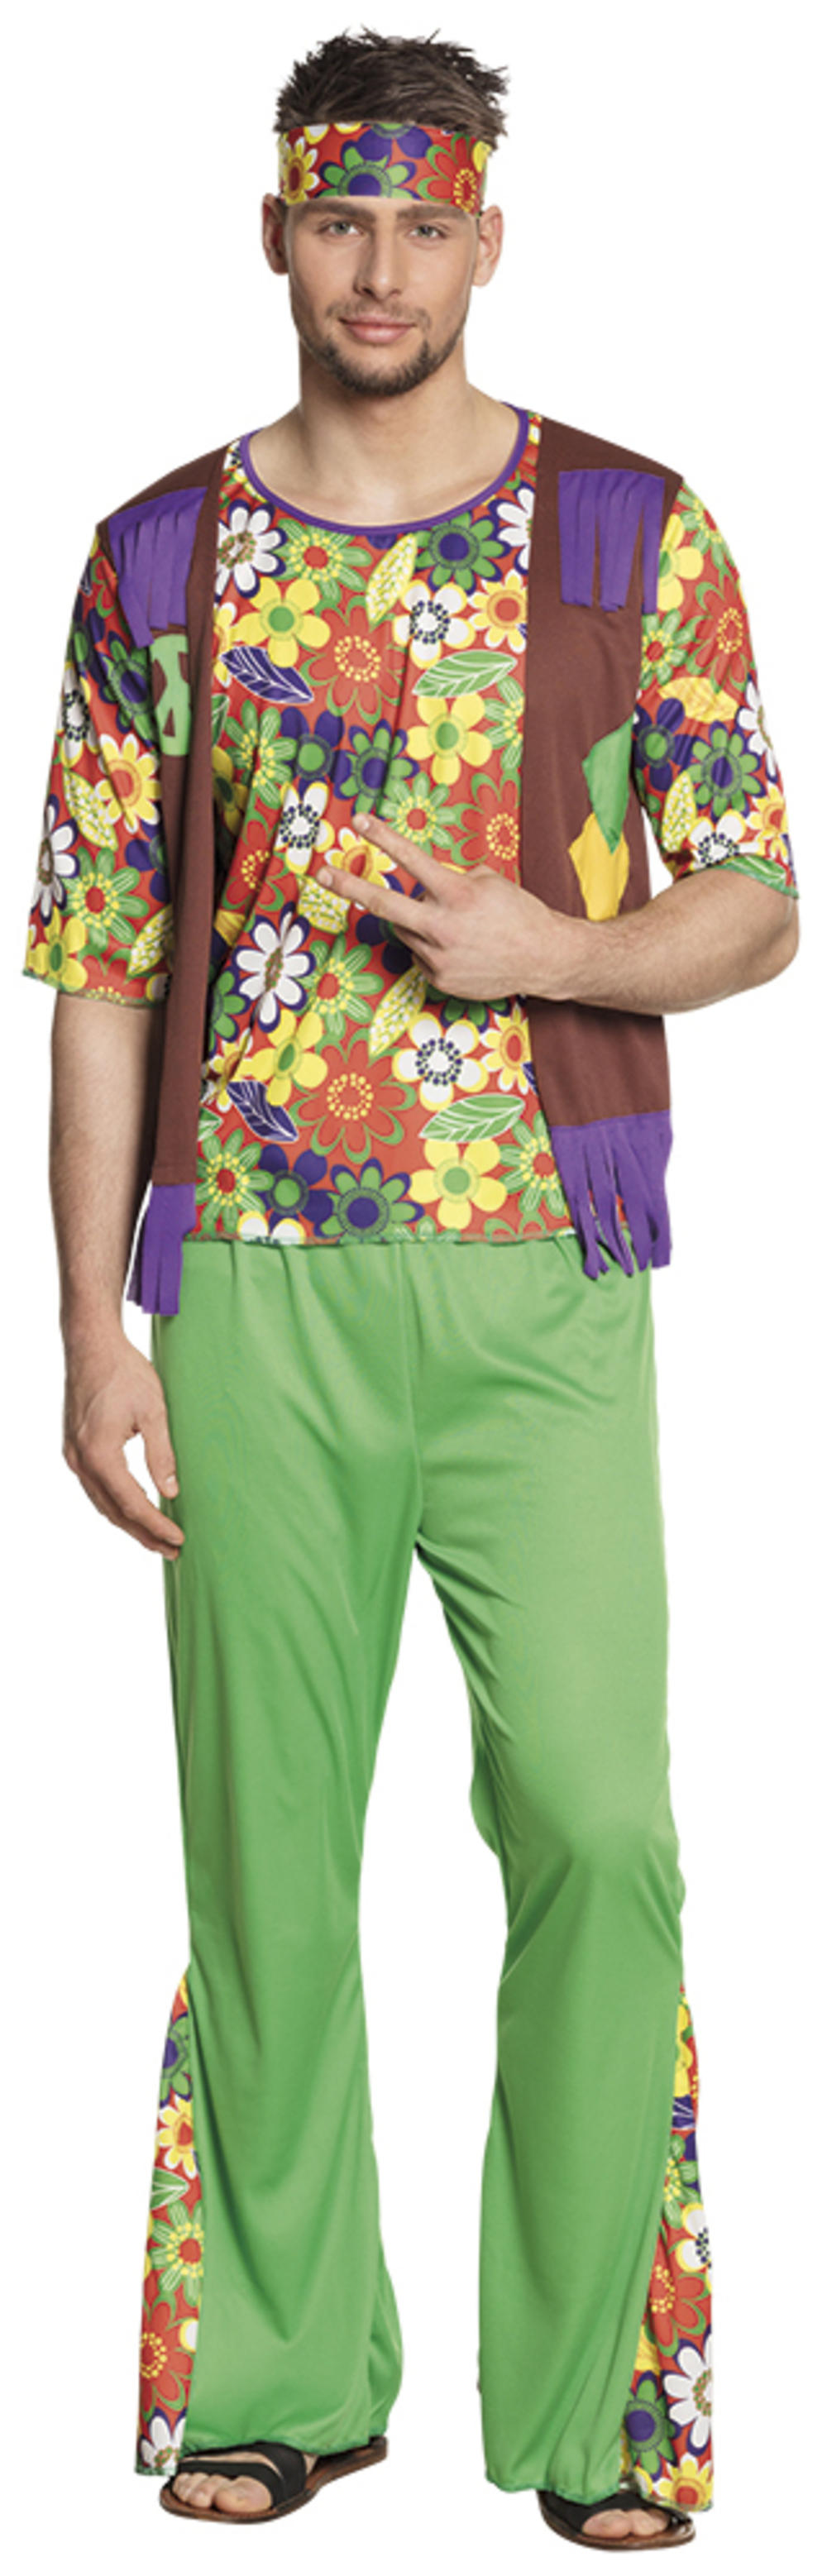 Woodstock Man Costume